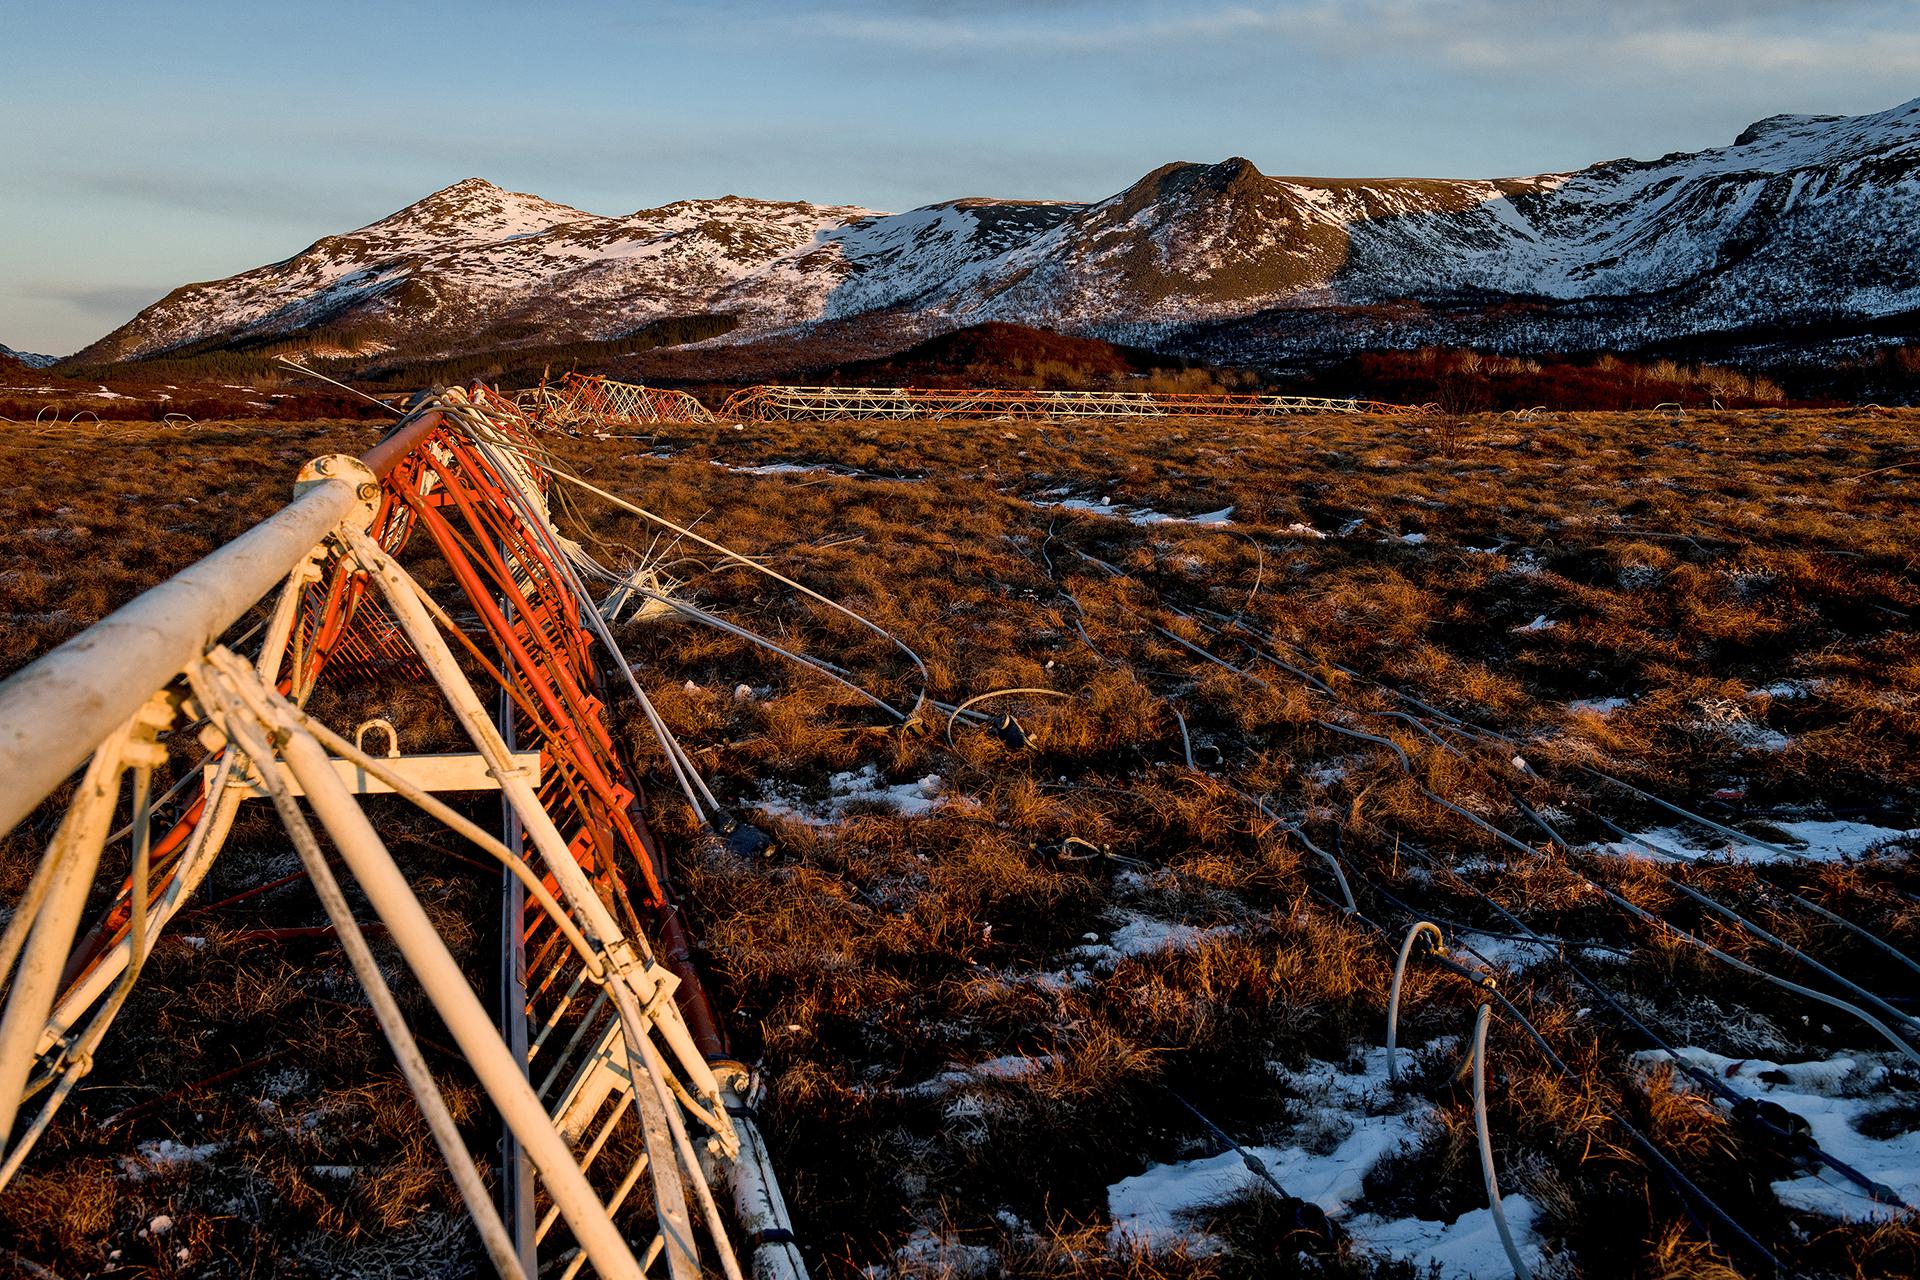 Demolition of Loran-C radio mast in Vesterålen. Photo: AF Gruppen/Fartein Rudjord